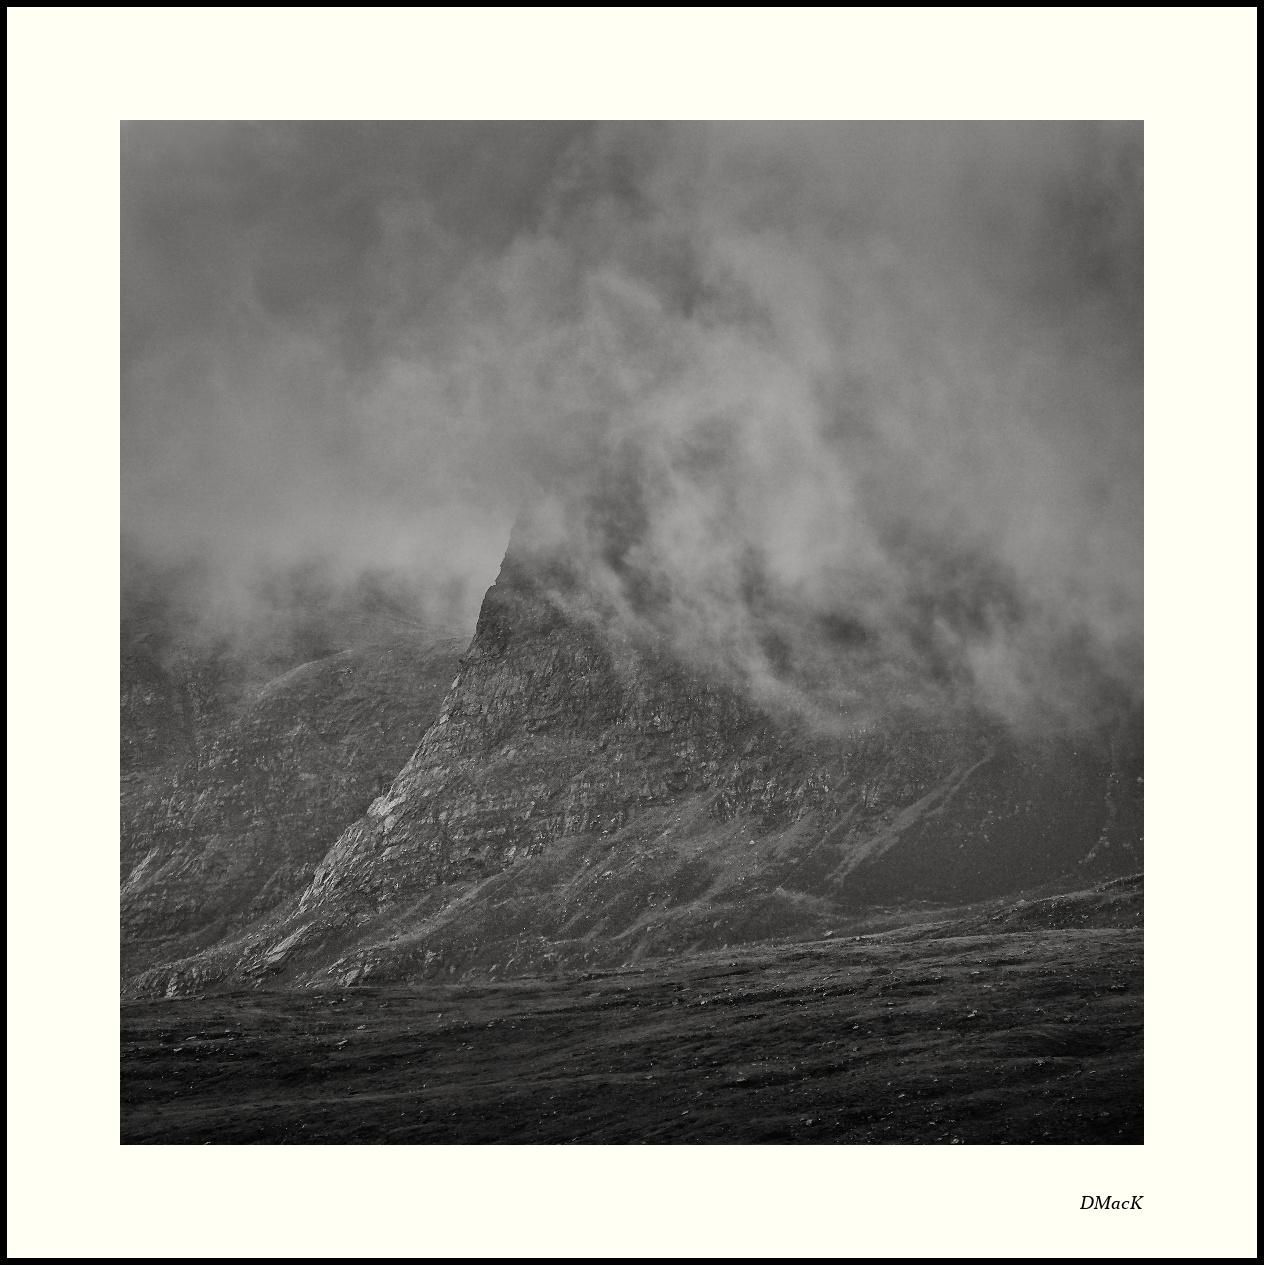 Beinn nan Caorach climbs into cloud